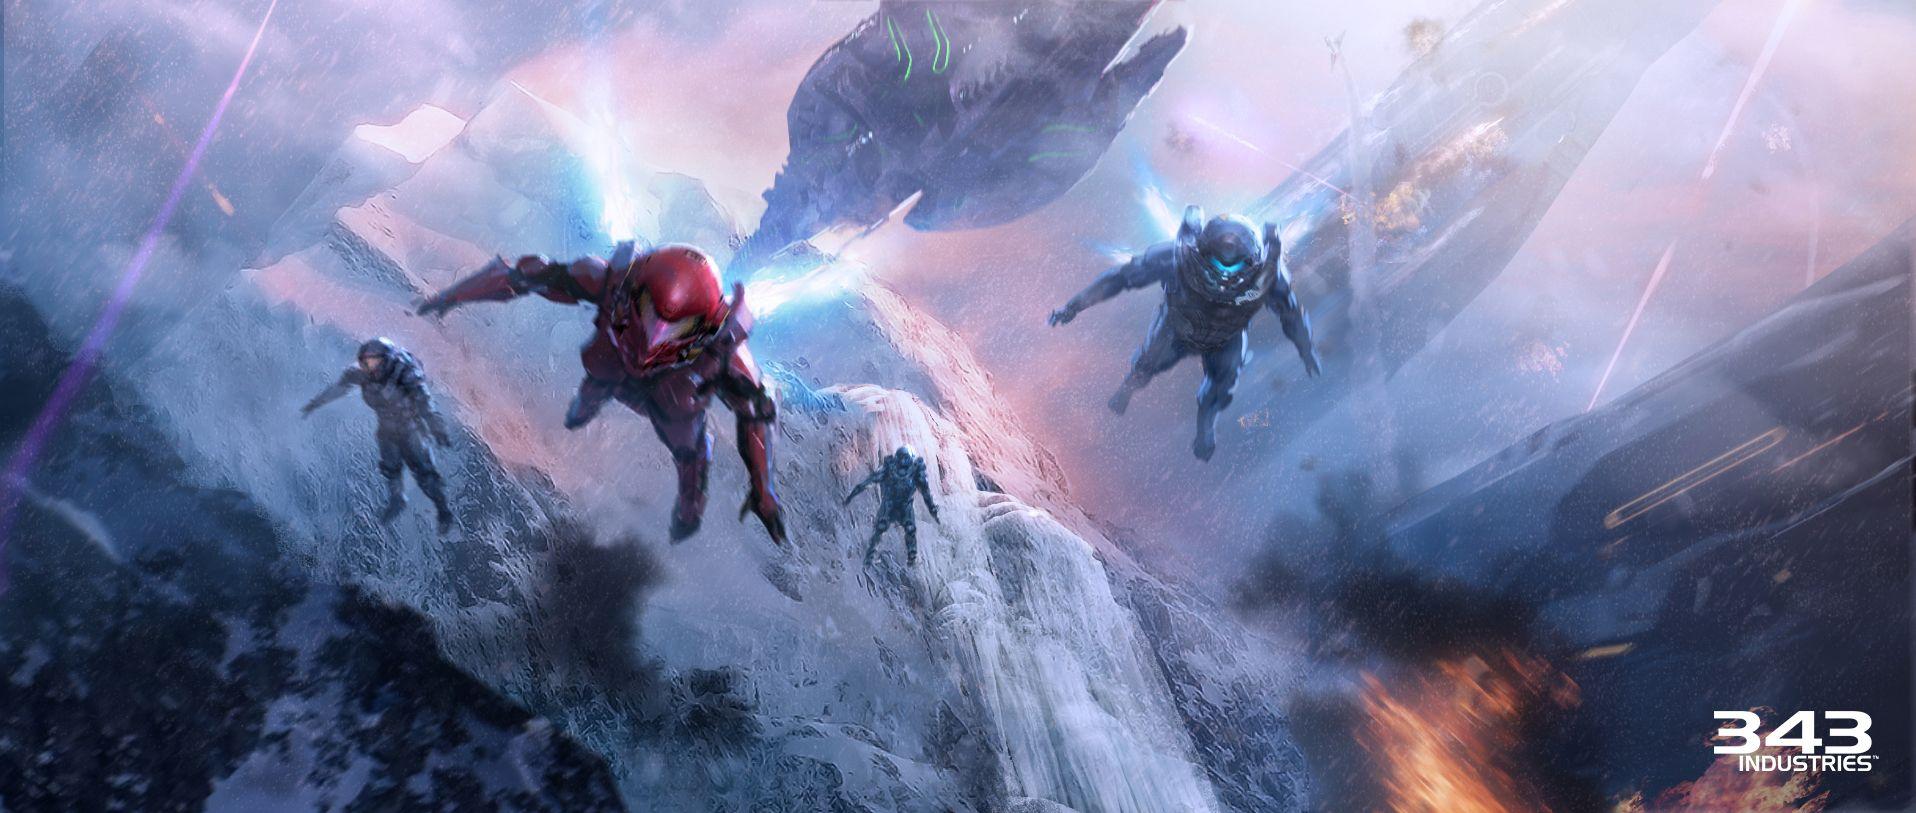 Halo 5 computer wallpaper wallpapersafari - Halo 5 guardians wallpaper 1920x1080 ...